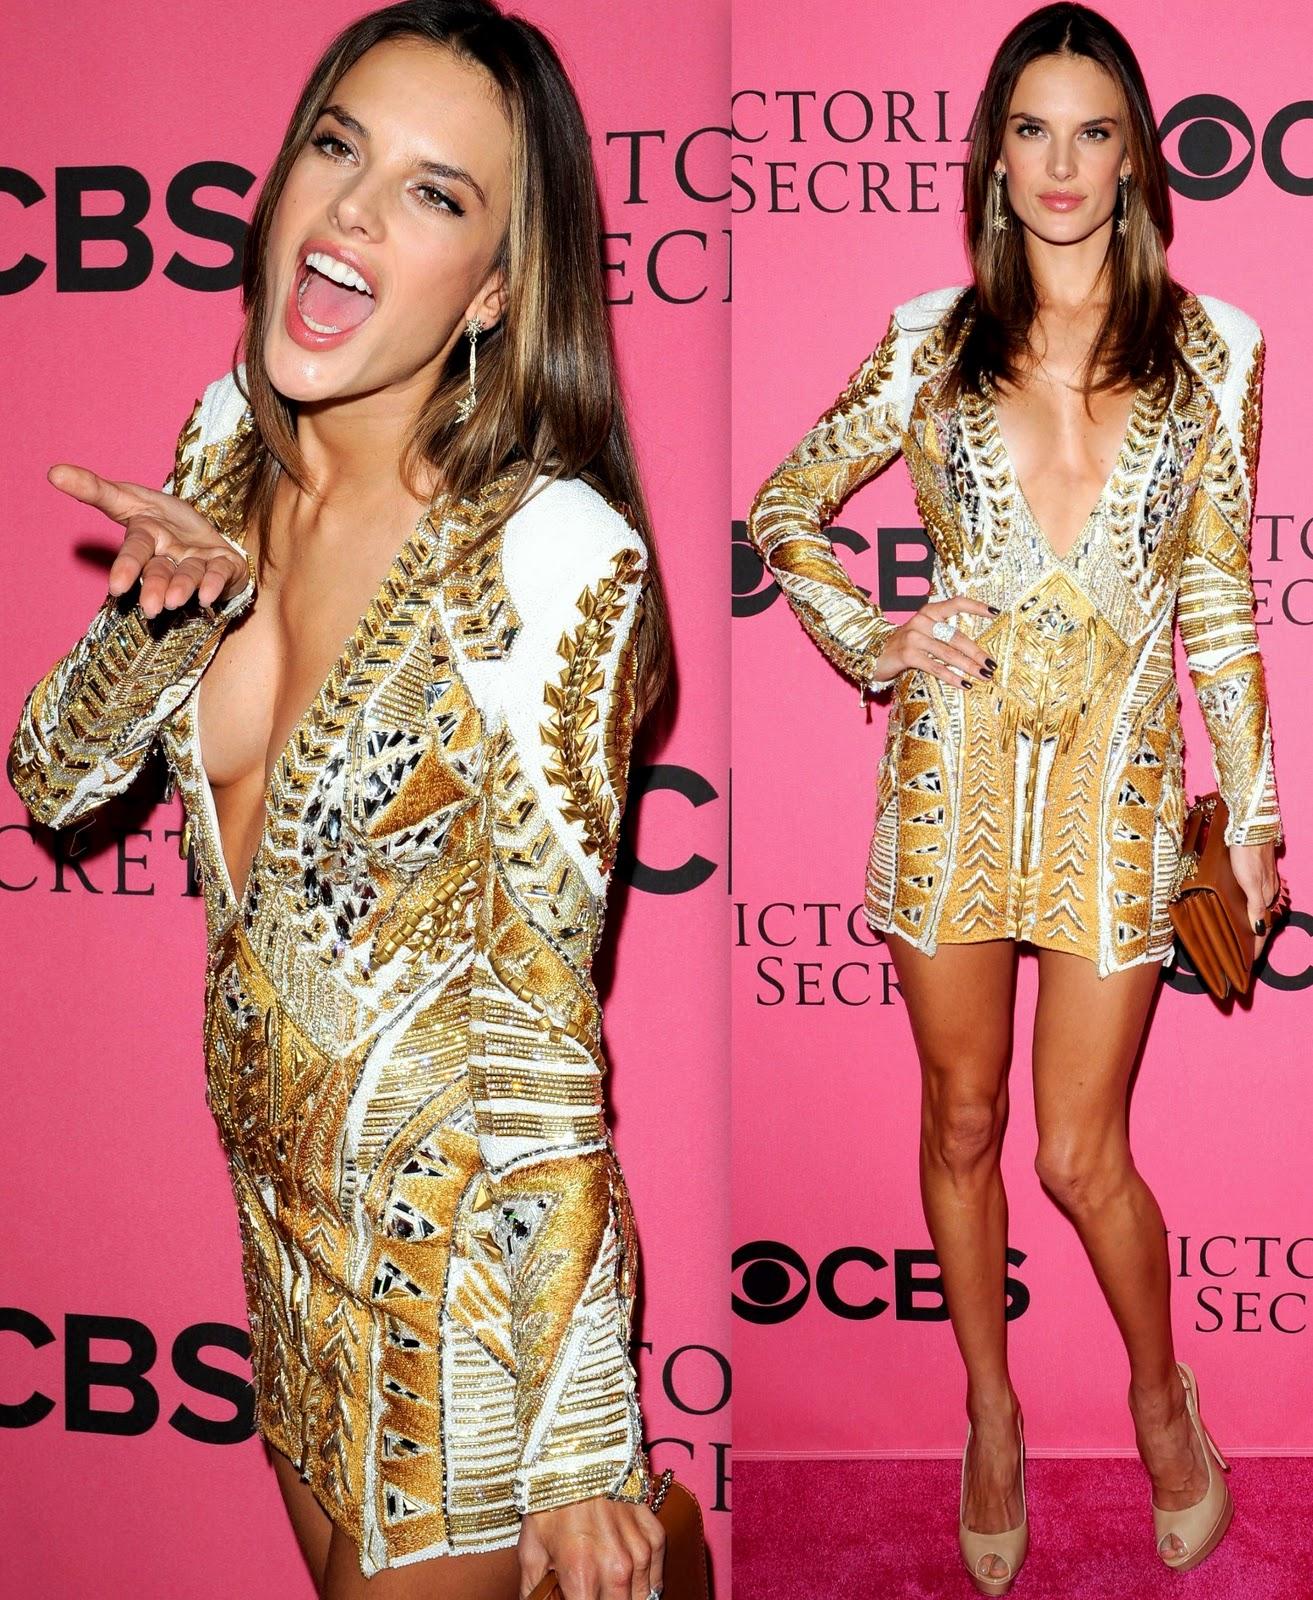 http://3.bp.blogspot.com/-3Uly2g9dJFE/TtjC4m1RYrI/AAAAAAAAZqs/UEsvPfdxwVc/s1600/ale+Victoria%2527s+Secret+Fashion+Show+Viewing+Party+2011+HQ+%25283%2529.jpg